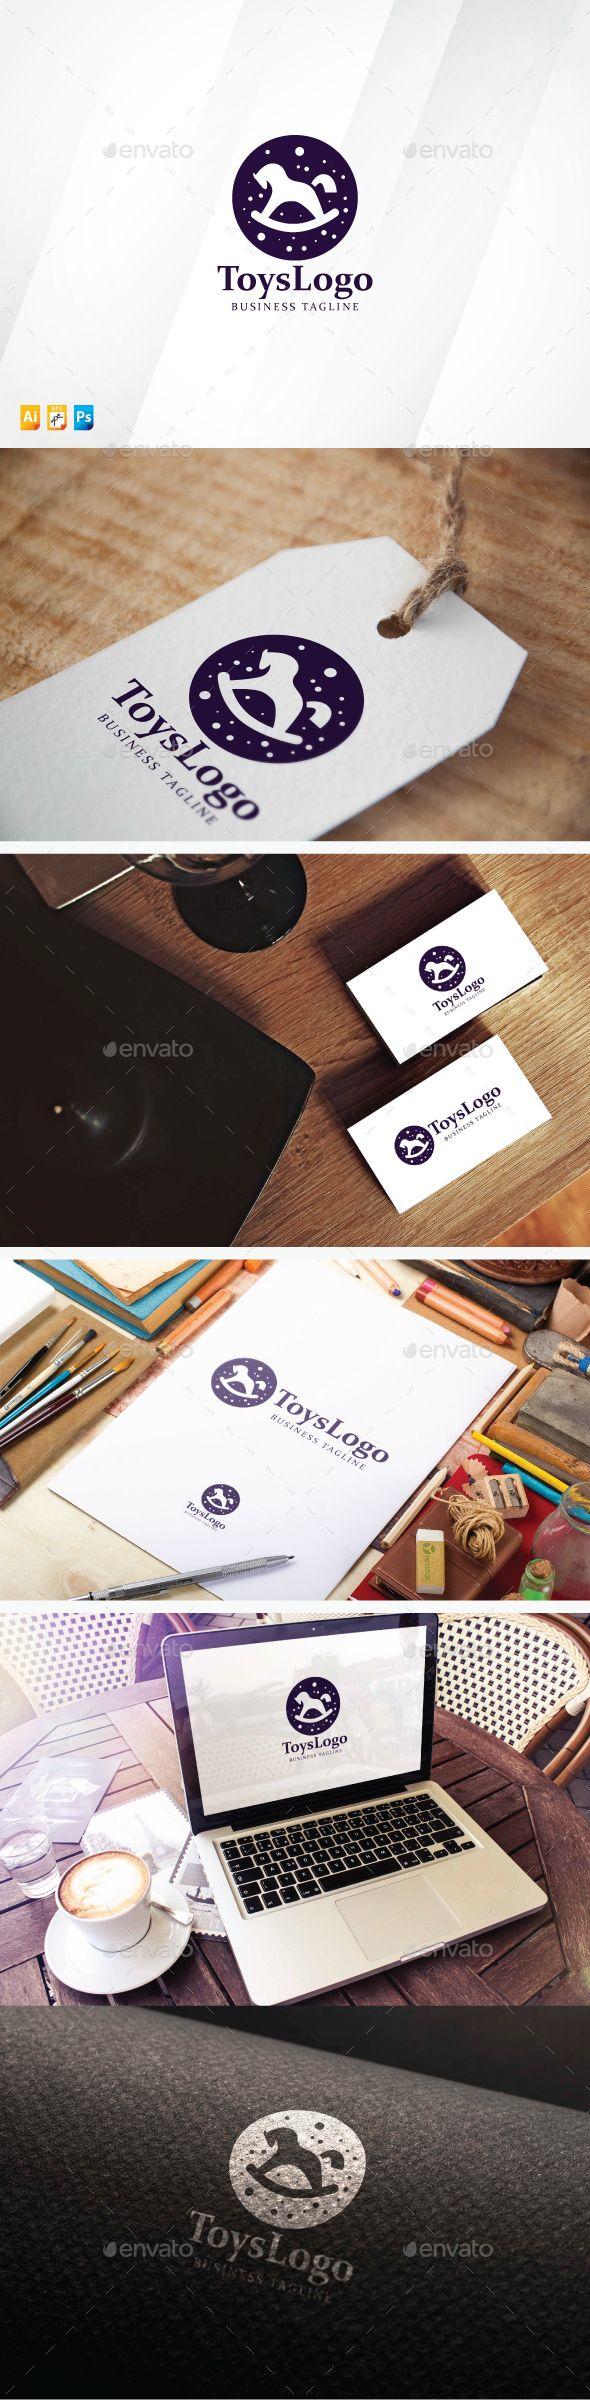 The 25+ best Logo Photoshop ideas on Pinterest | Logo desing ...